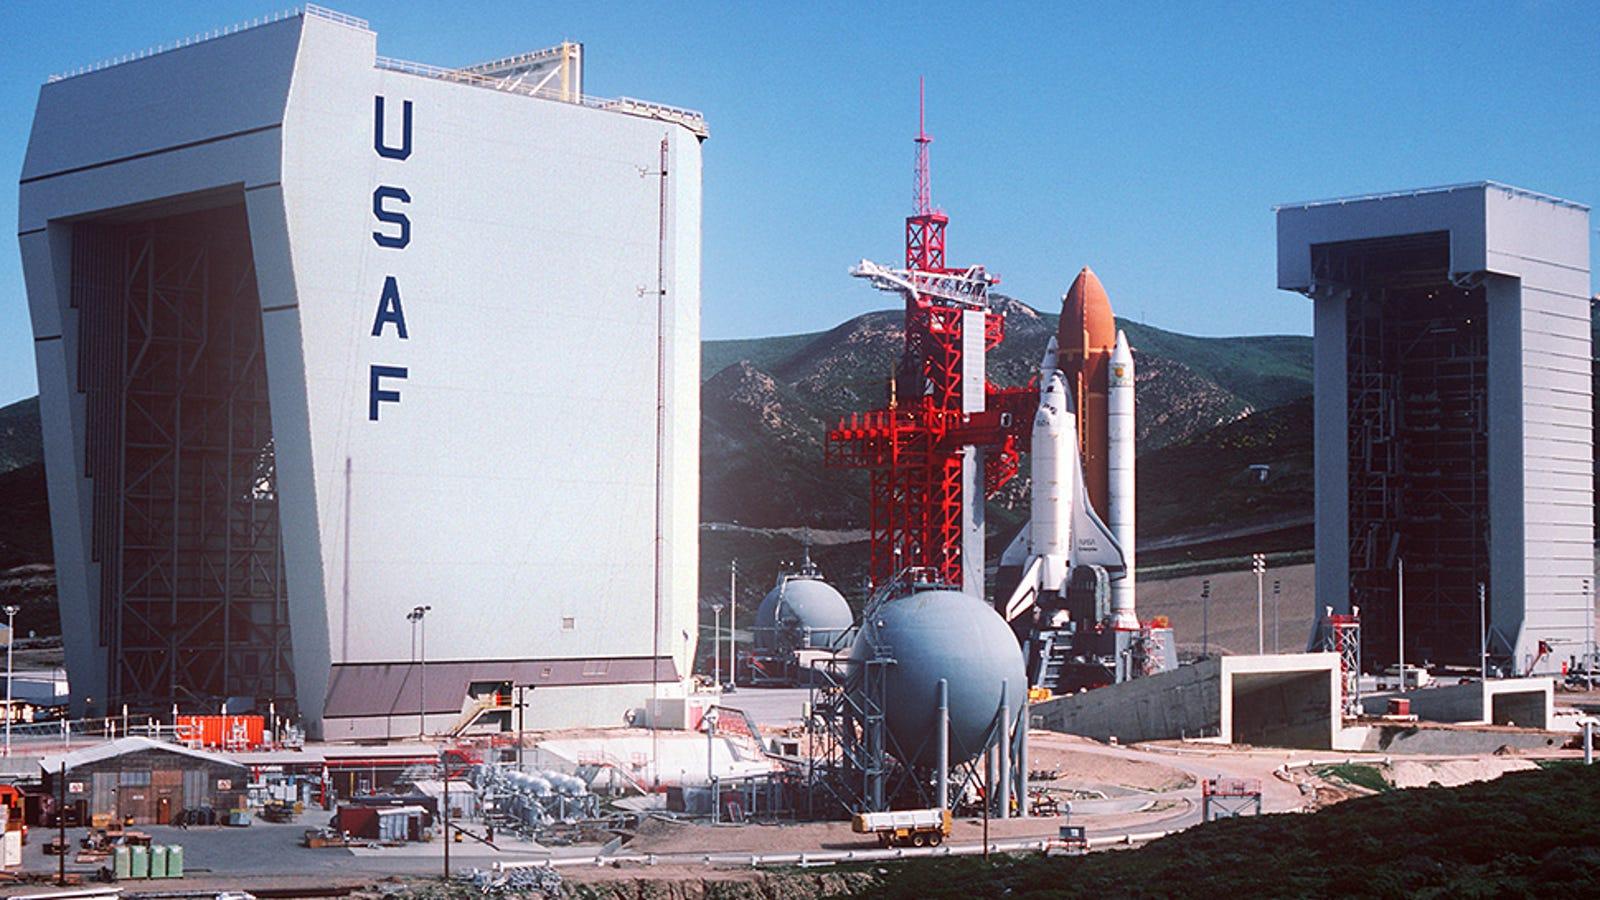 space shuttle ysco - photo #22